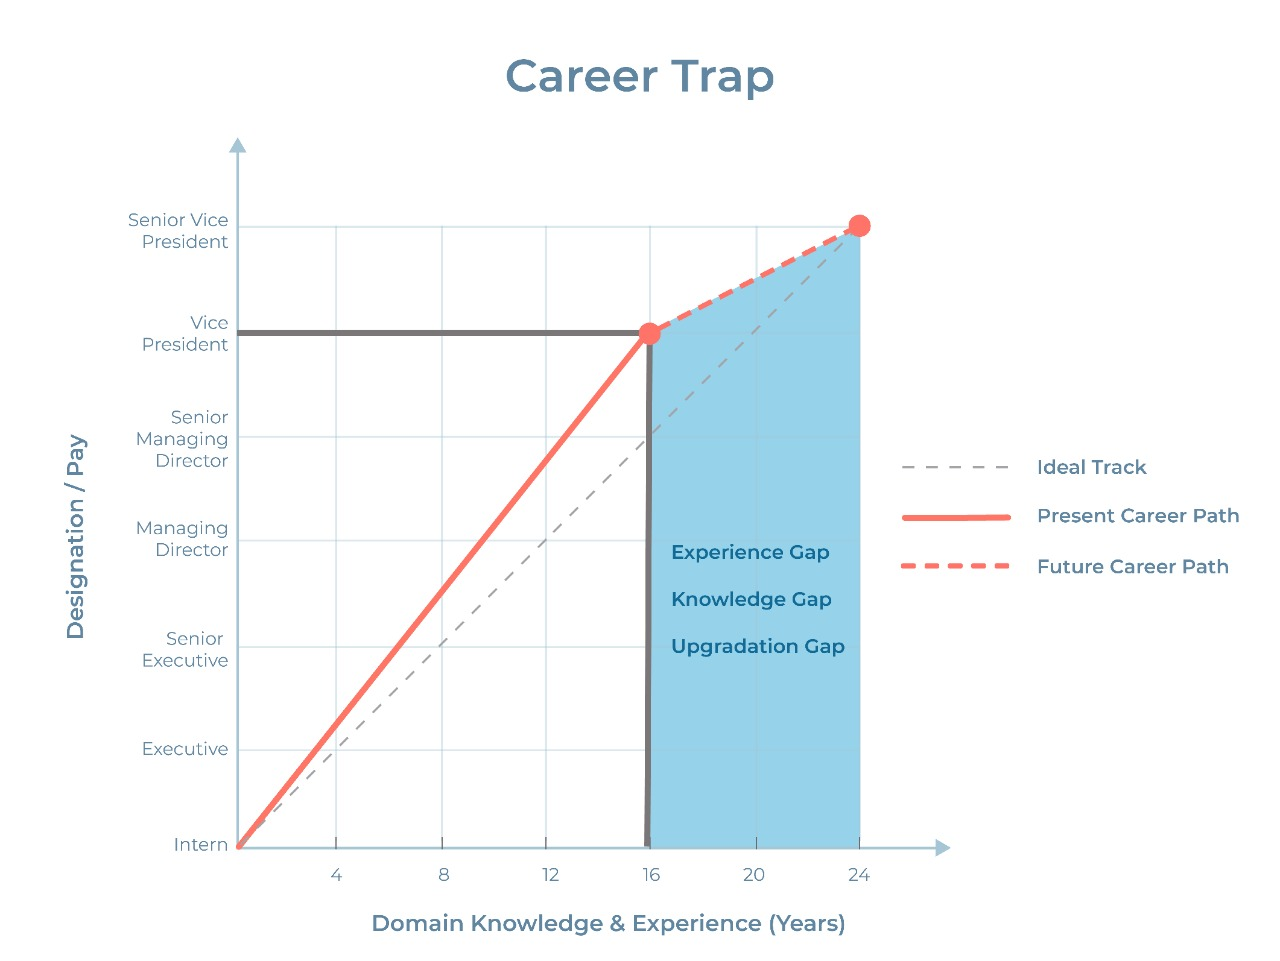 Career Trap by thedigitalfellow